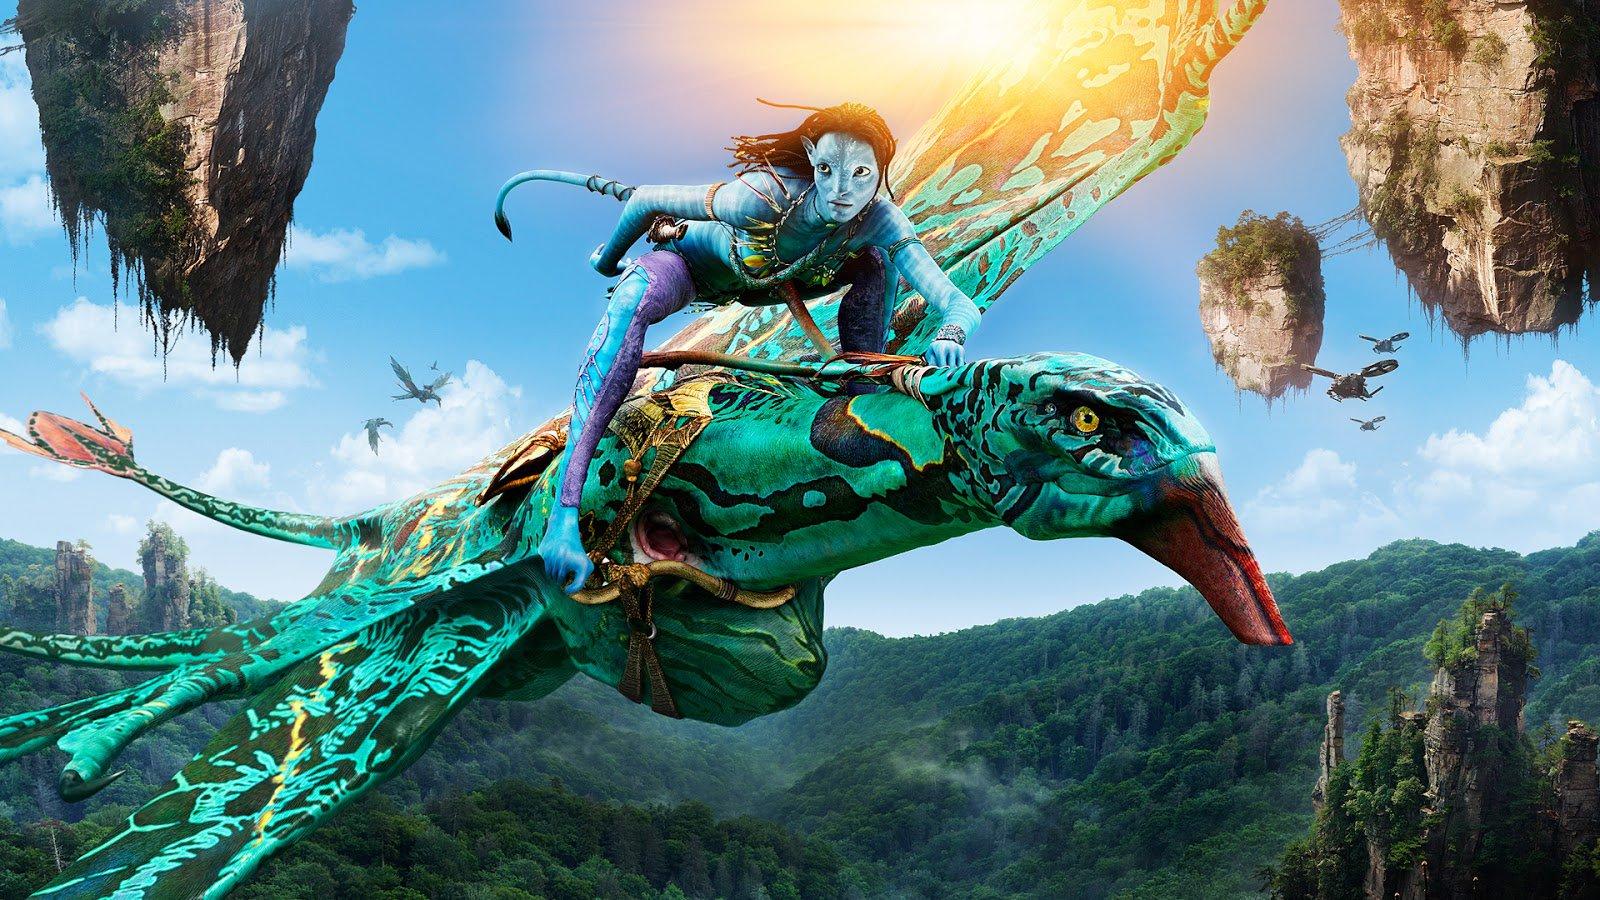 avatar avatar2 avatar movie James Cameron james cameron net worth